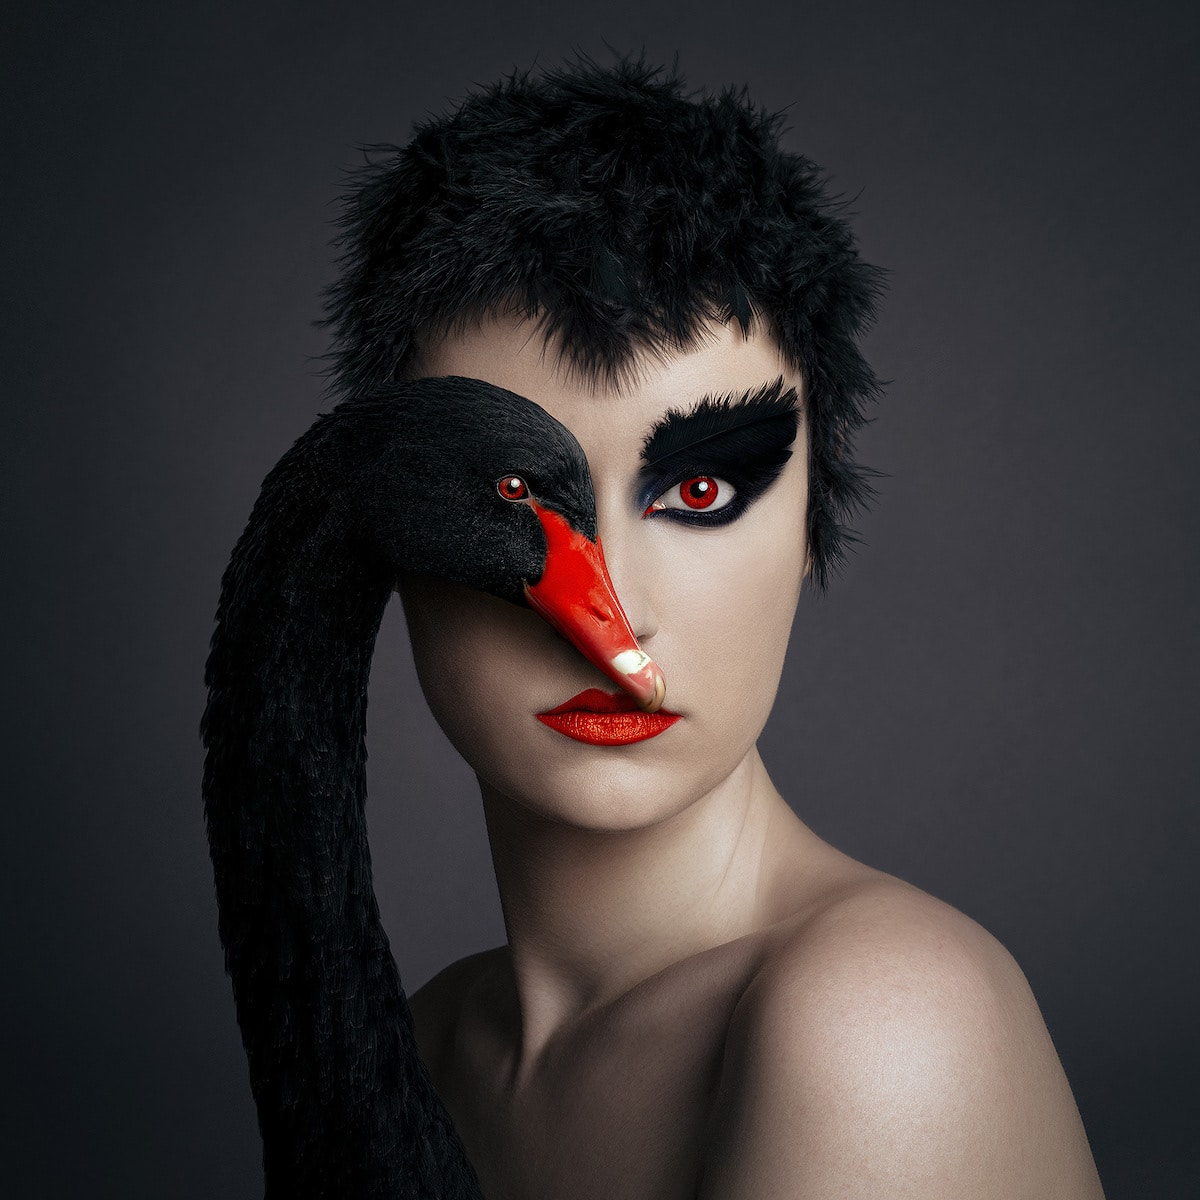 Autorretrato original con un cisne negro